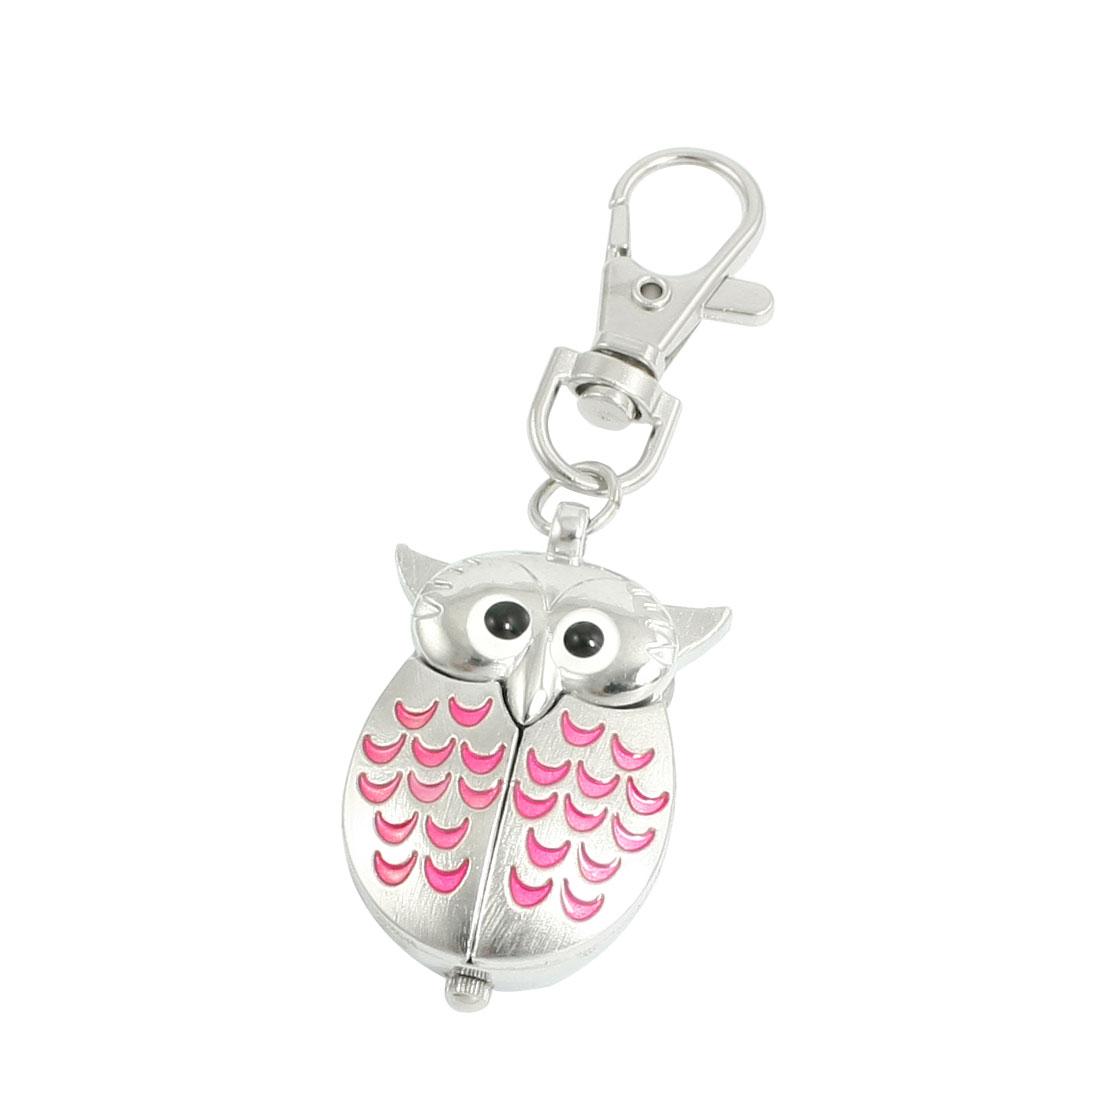 Home Metal Owl Pendant Knob Adjustable Time Keyring Watch Silver Tone